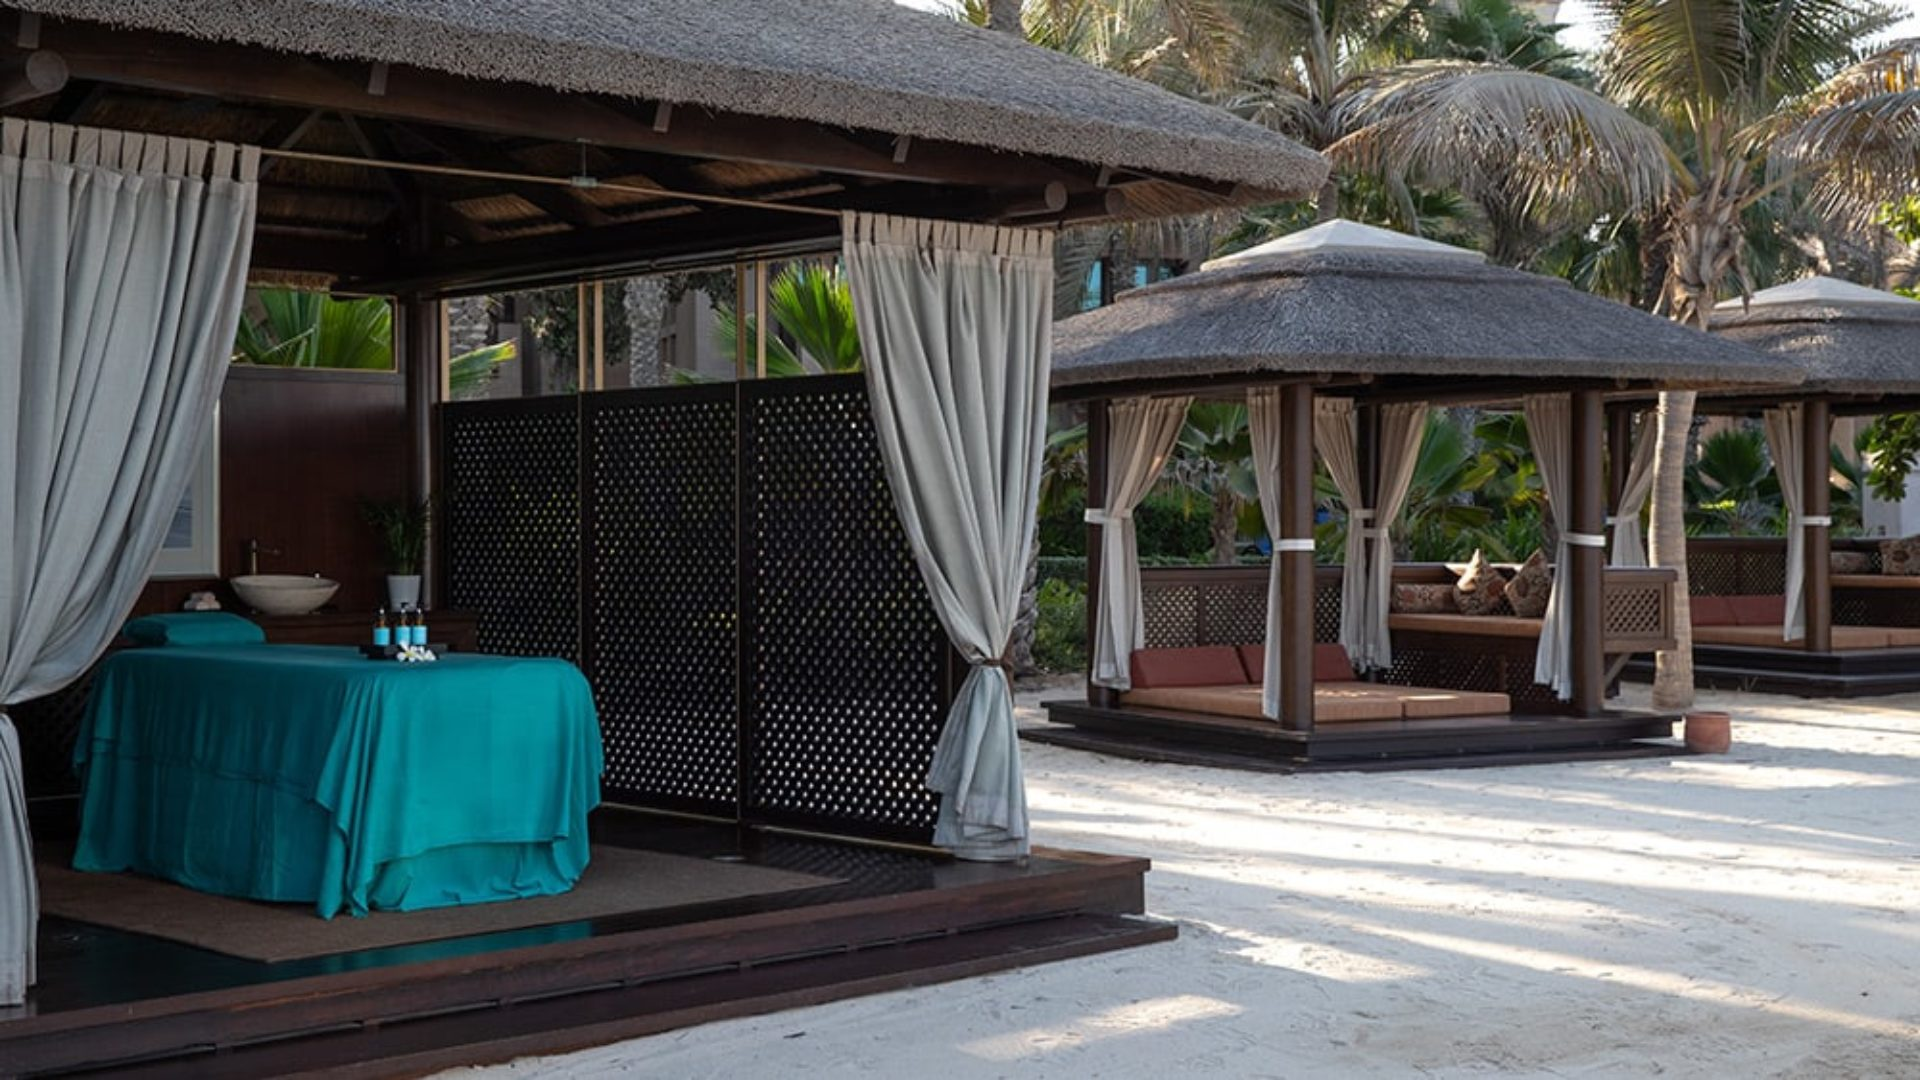 Beach spa cabanas at Jumeirah Dar Al Masyaf